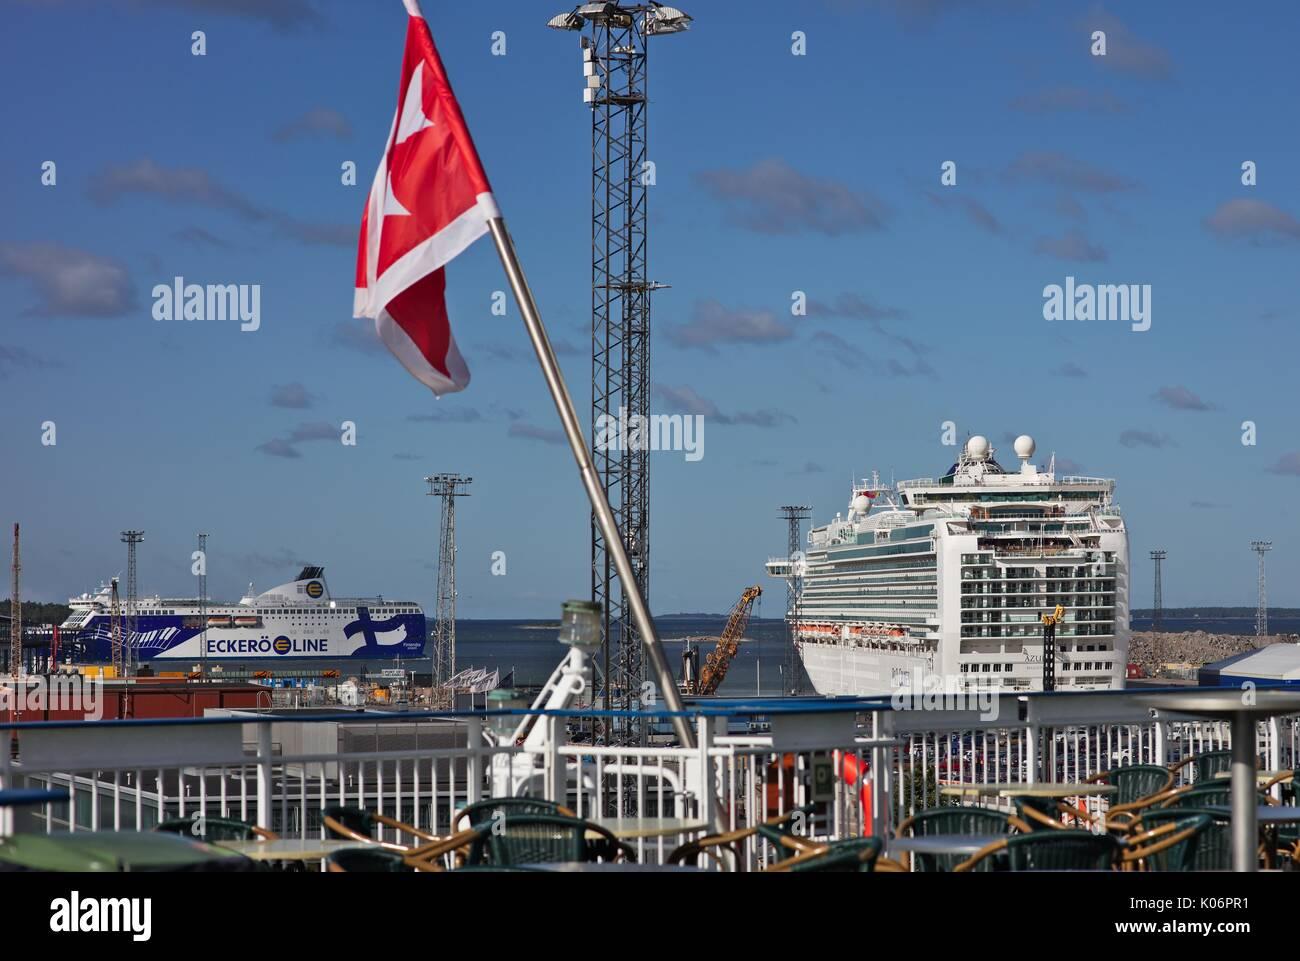 White Maltese cross on red background flag, on cruise ship, Finland - Stock Image